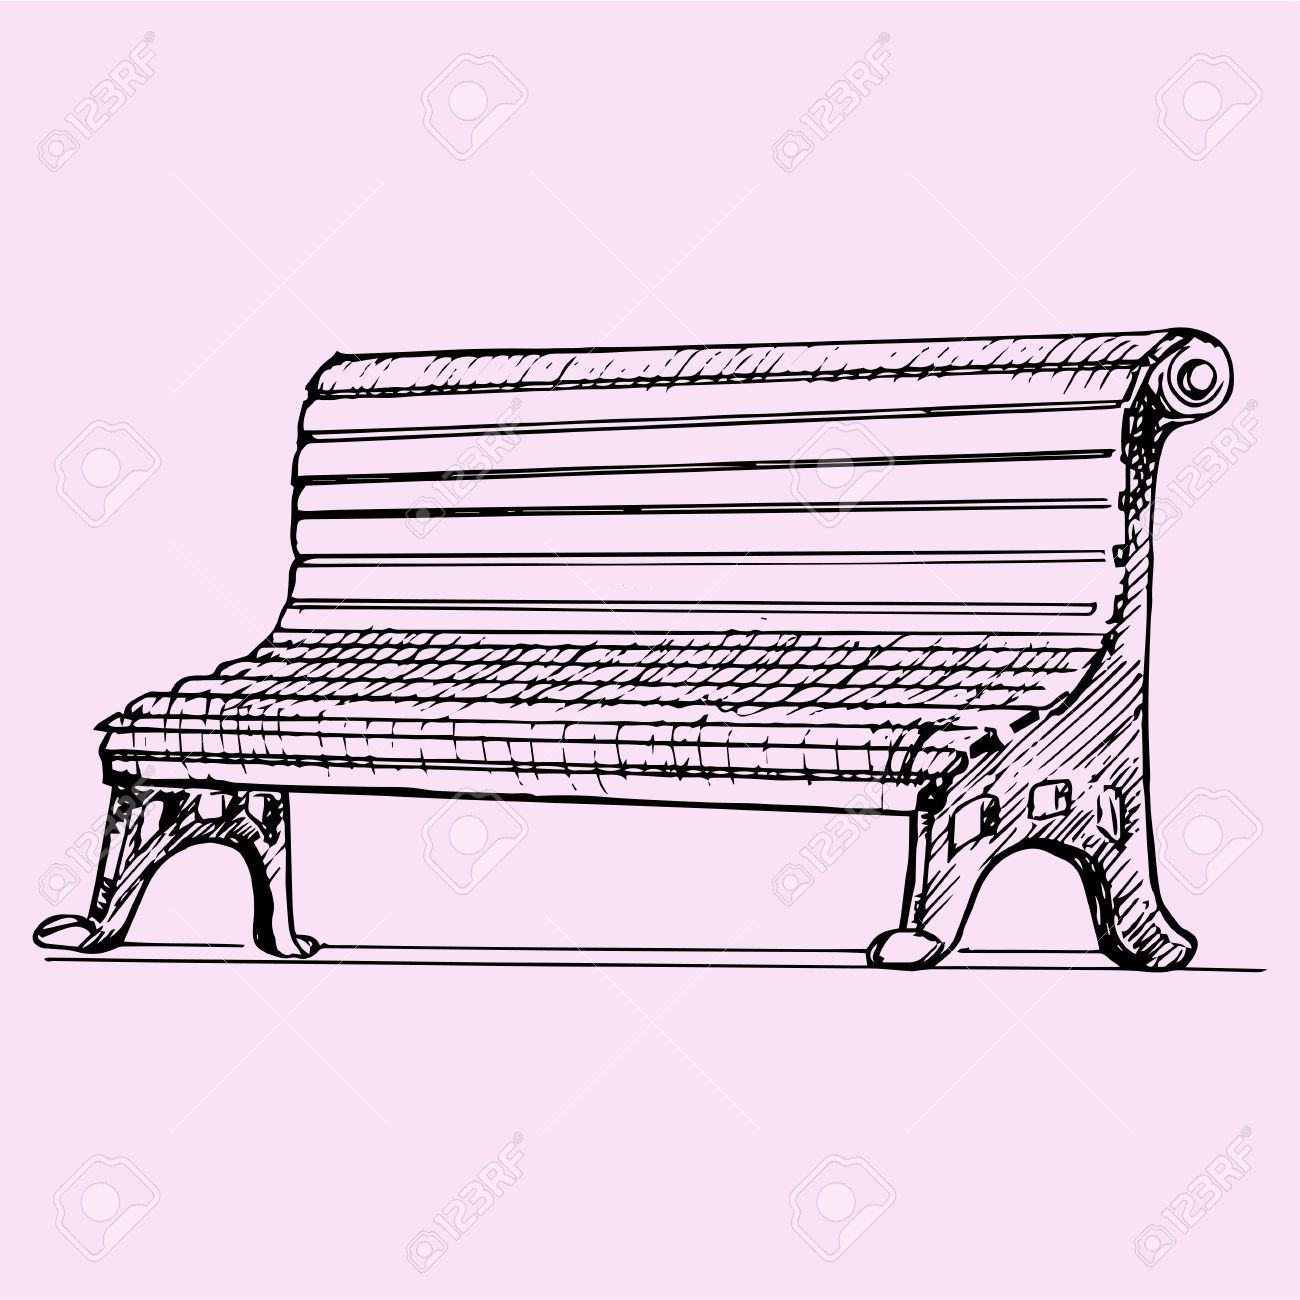 1300x1300 Park Bench, Doodle Style, Sketch Illustration Royalty Free